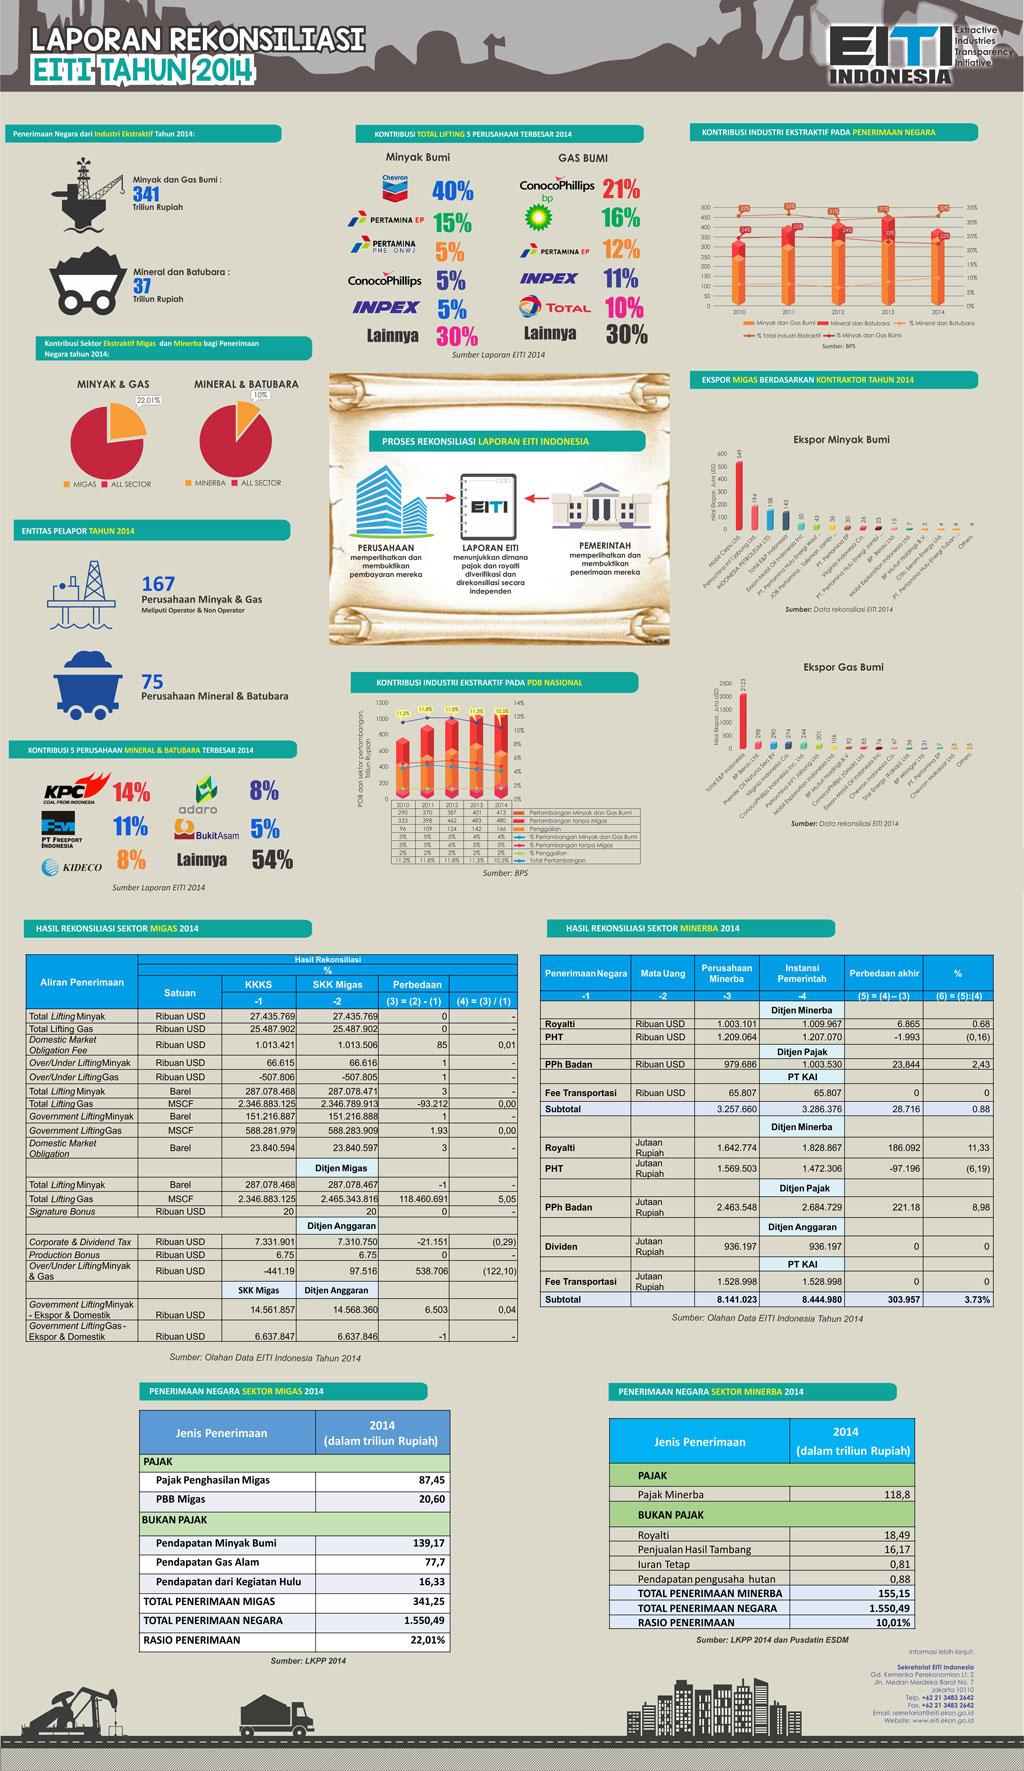 Laporan Rekonsiliasi EITI Tahun 2014